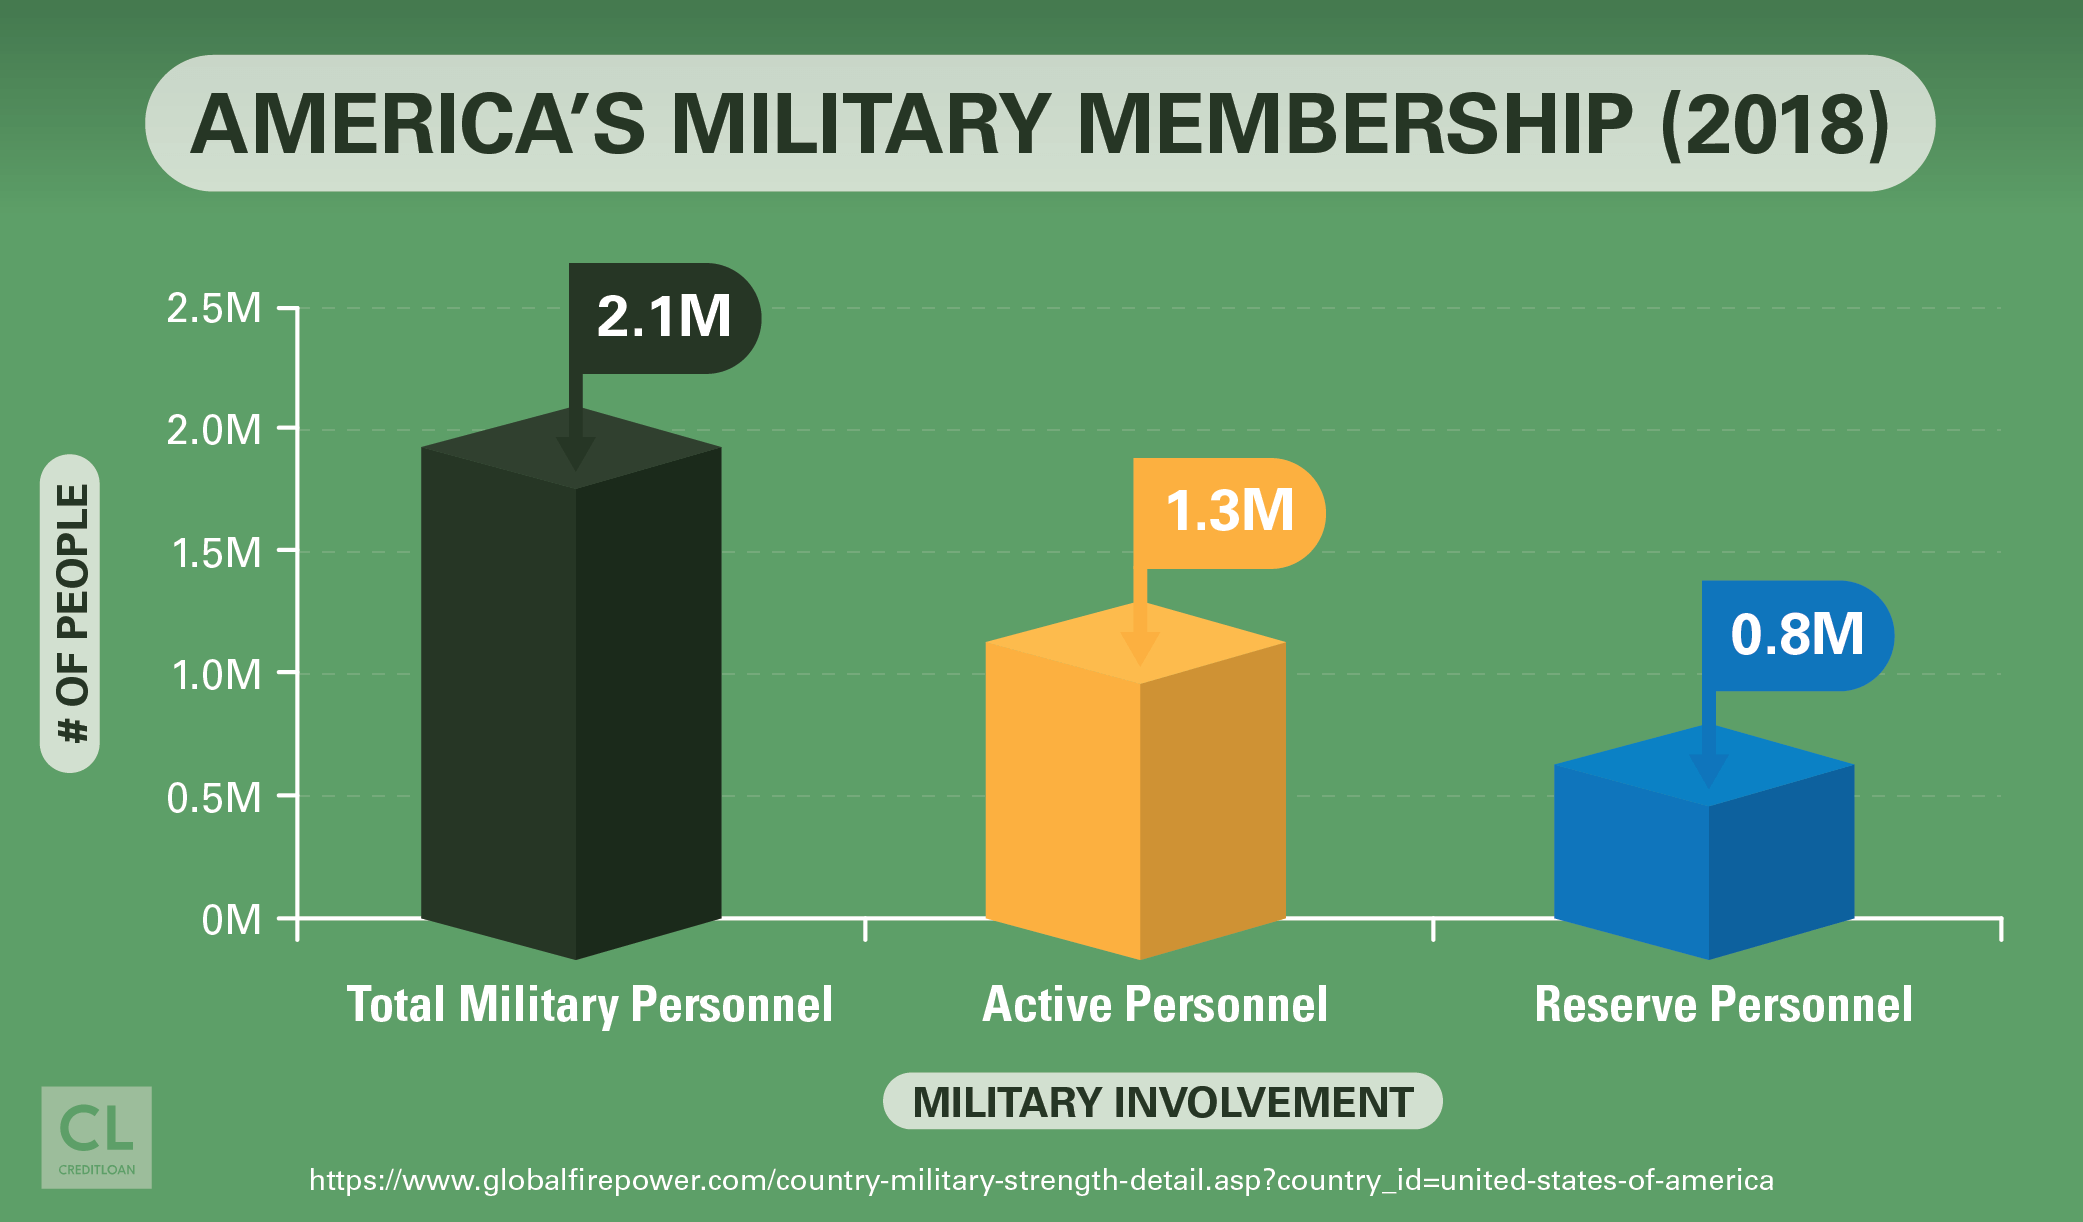 America's Military Membership 2018